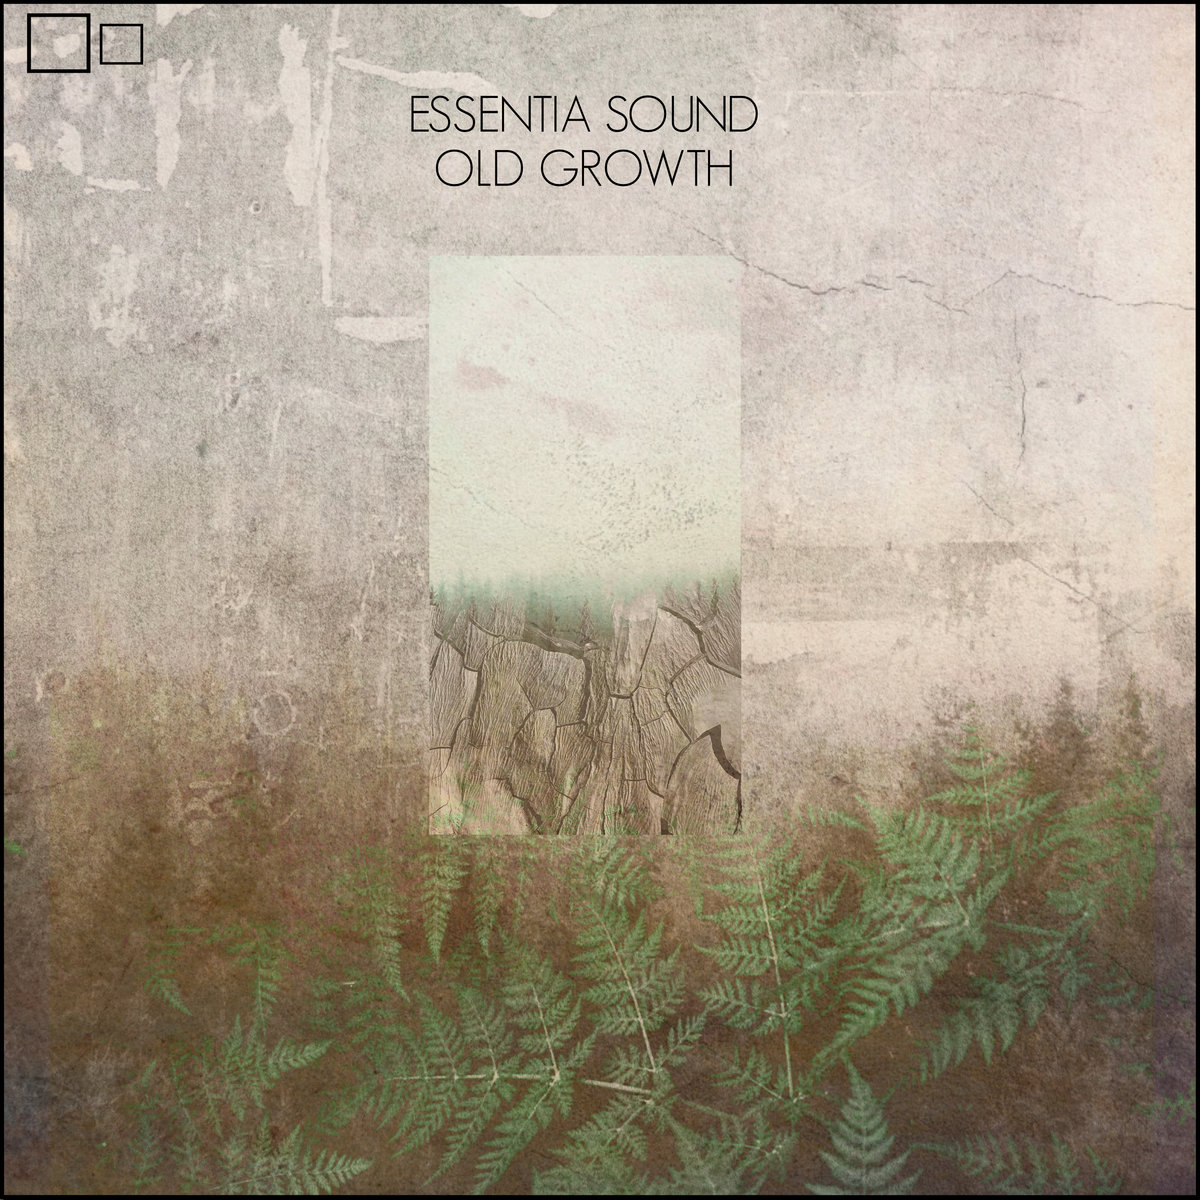 Essentia Sound – Old Growth